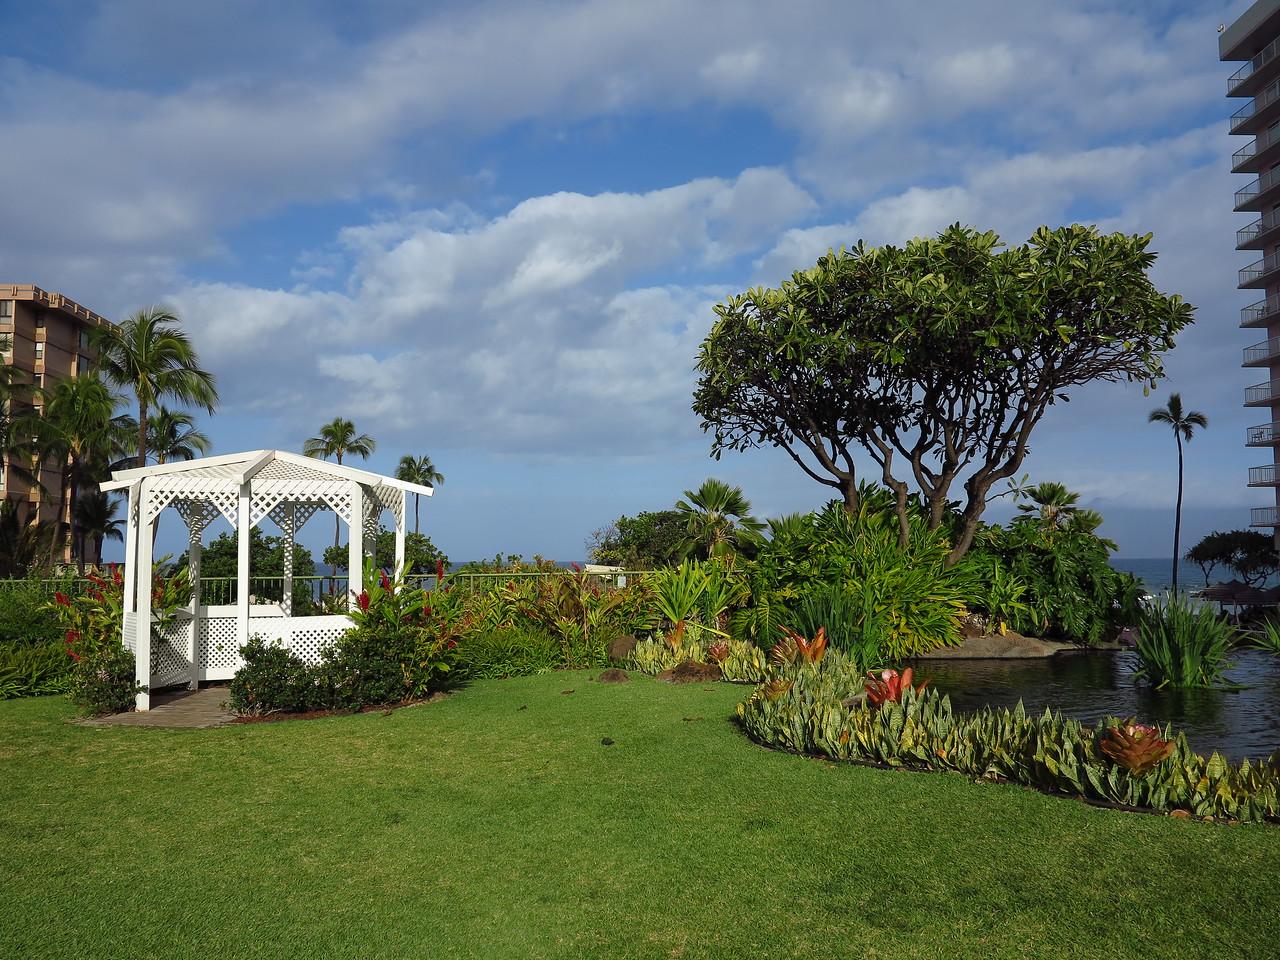 Ka'anapali Beach Club gazebo